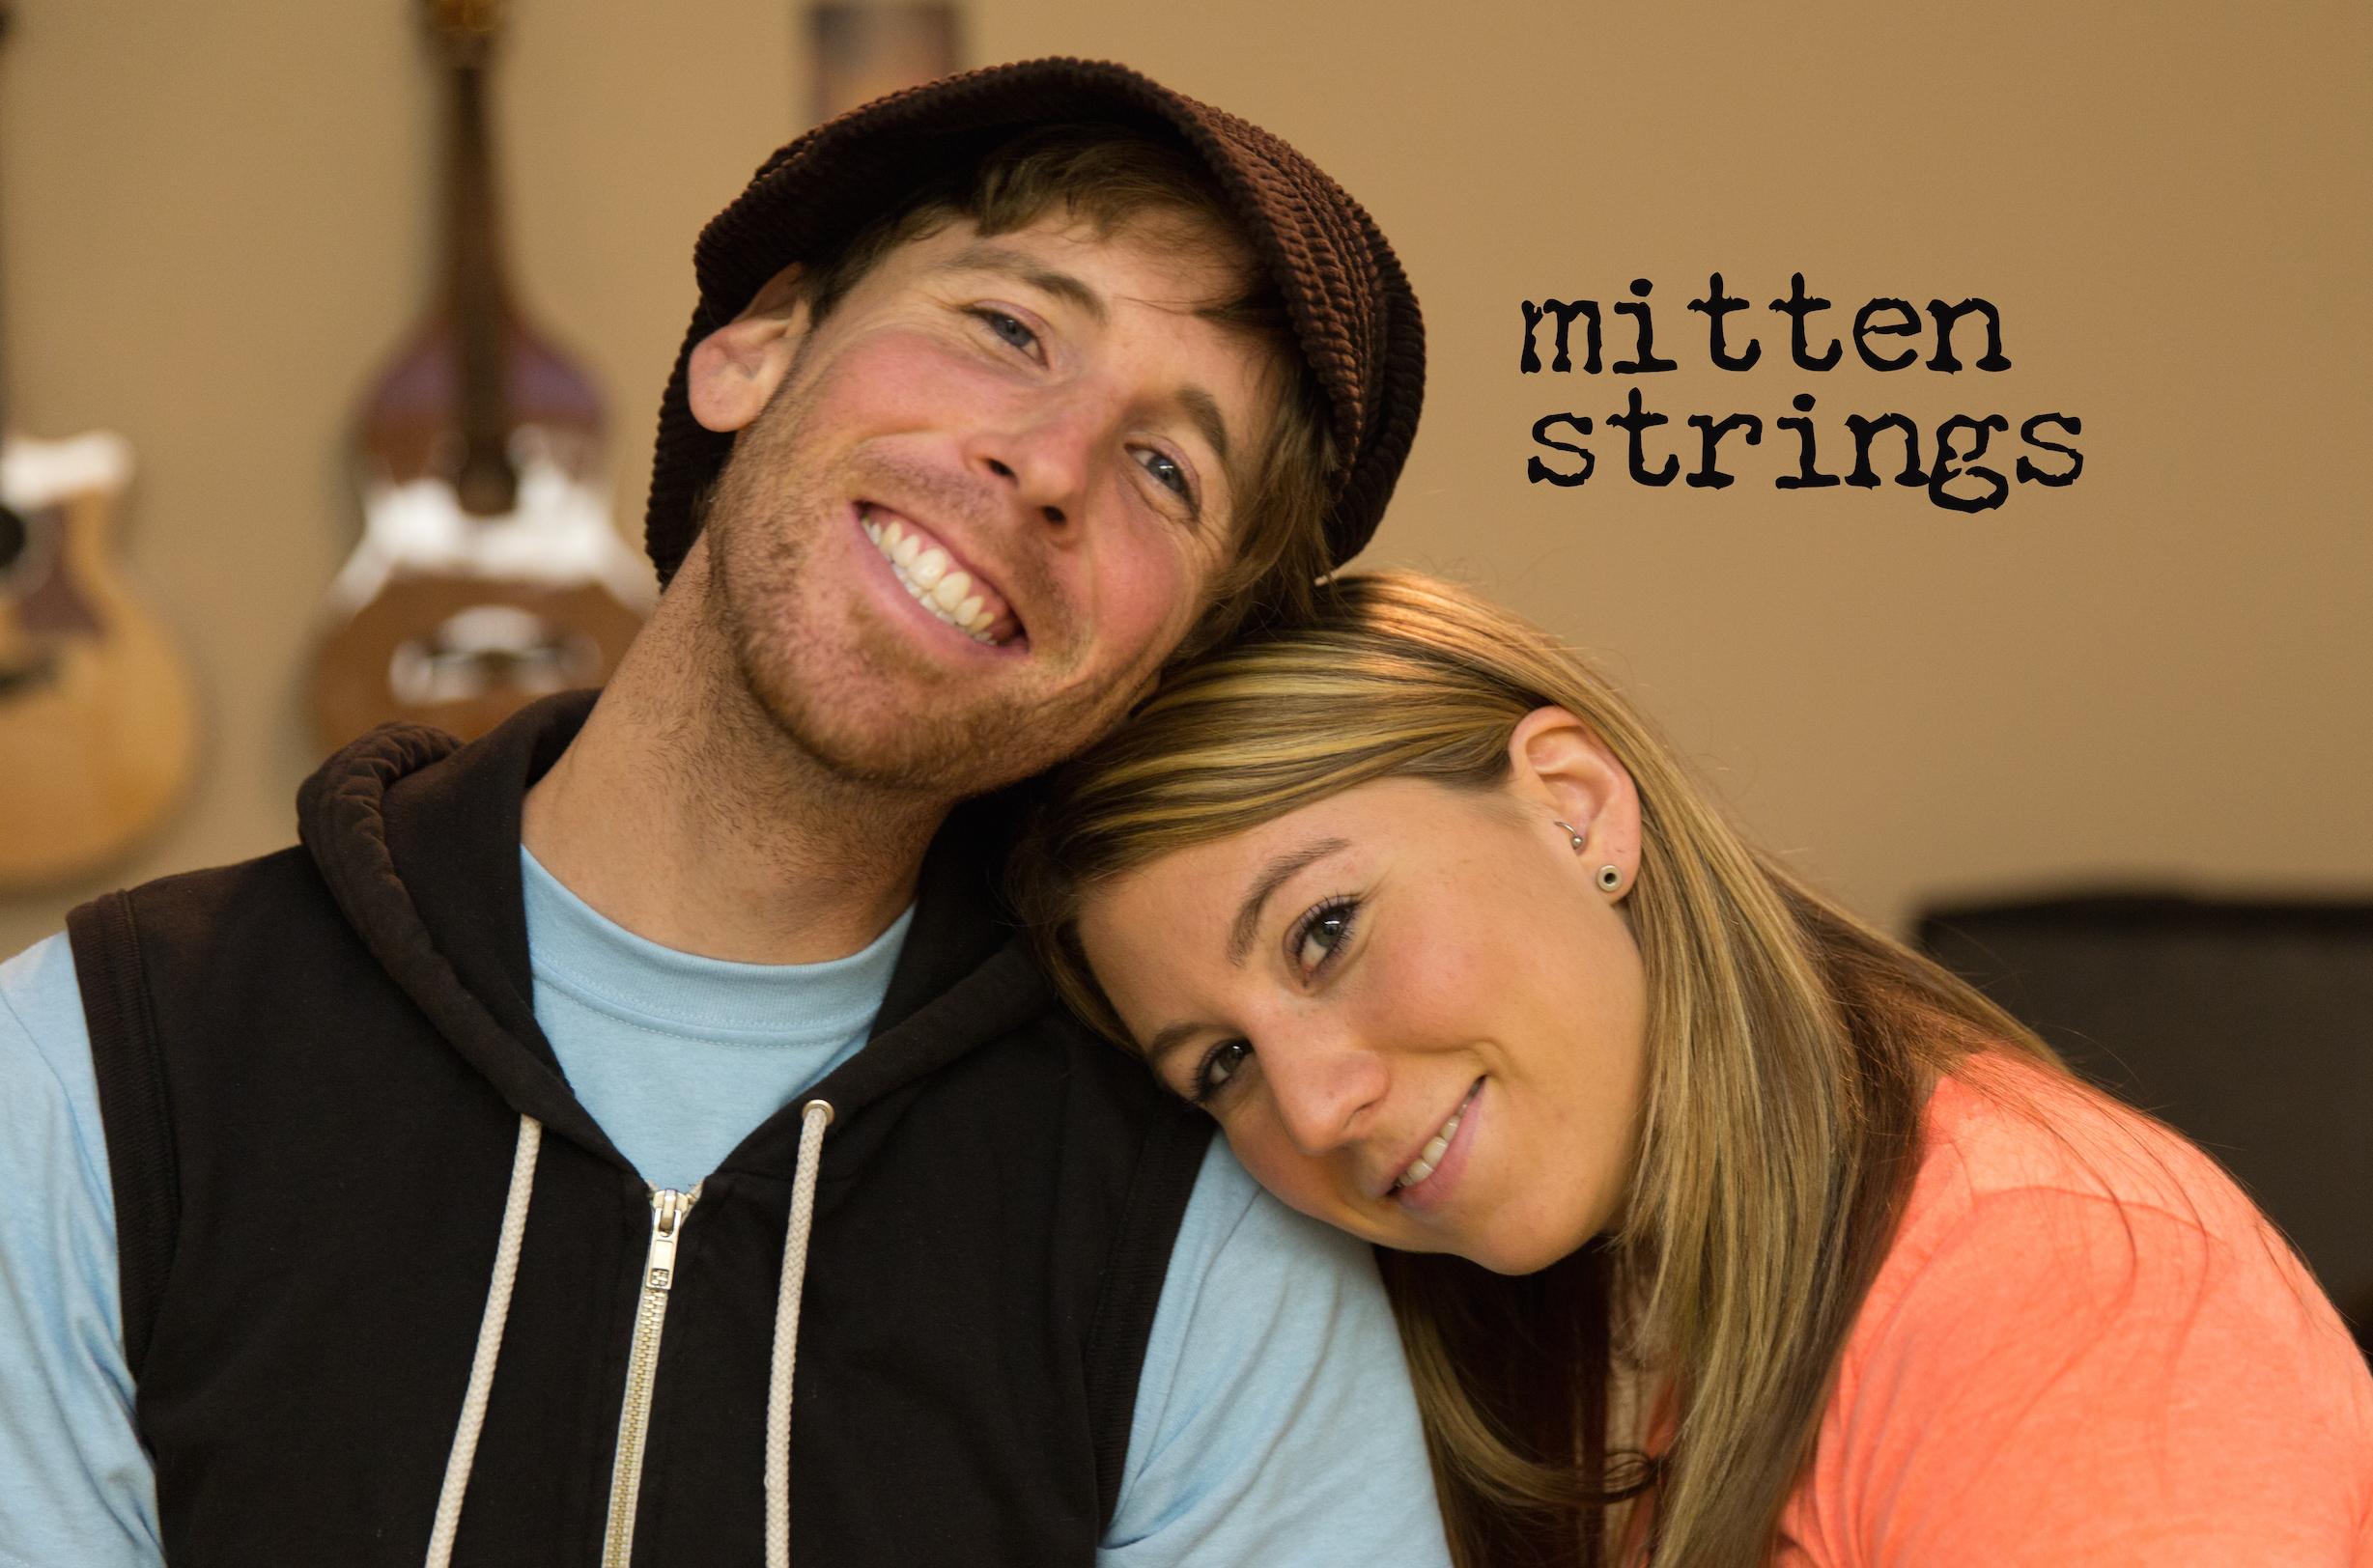 mitten strings